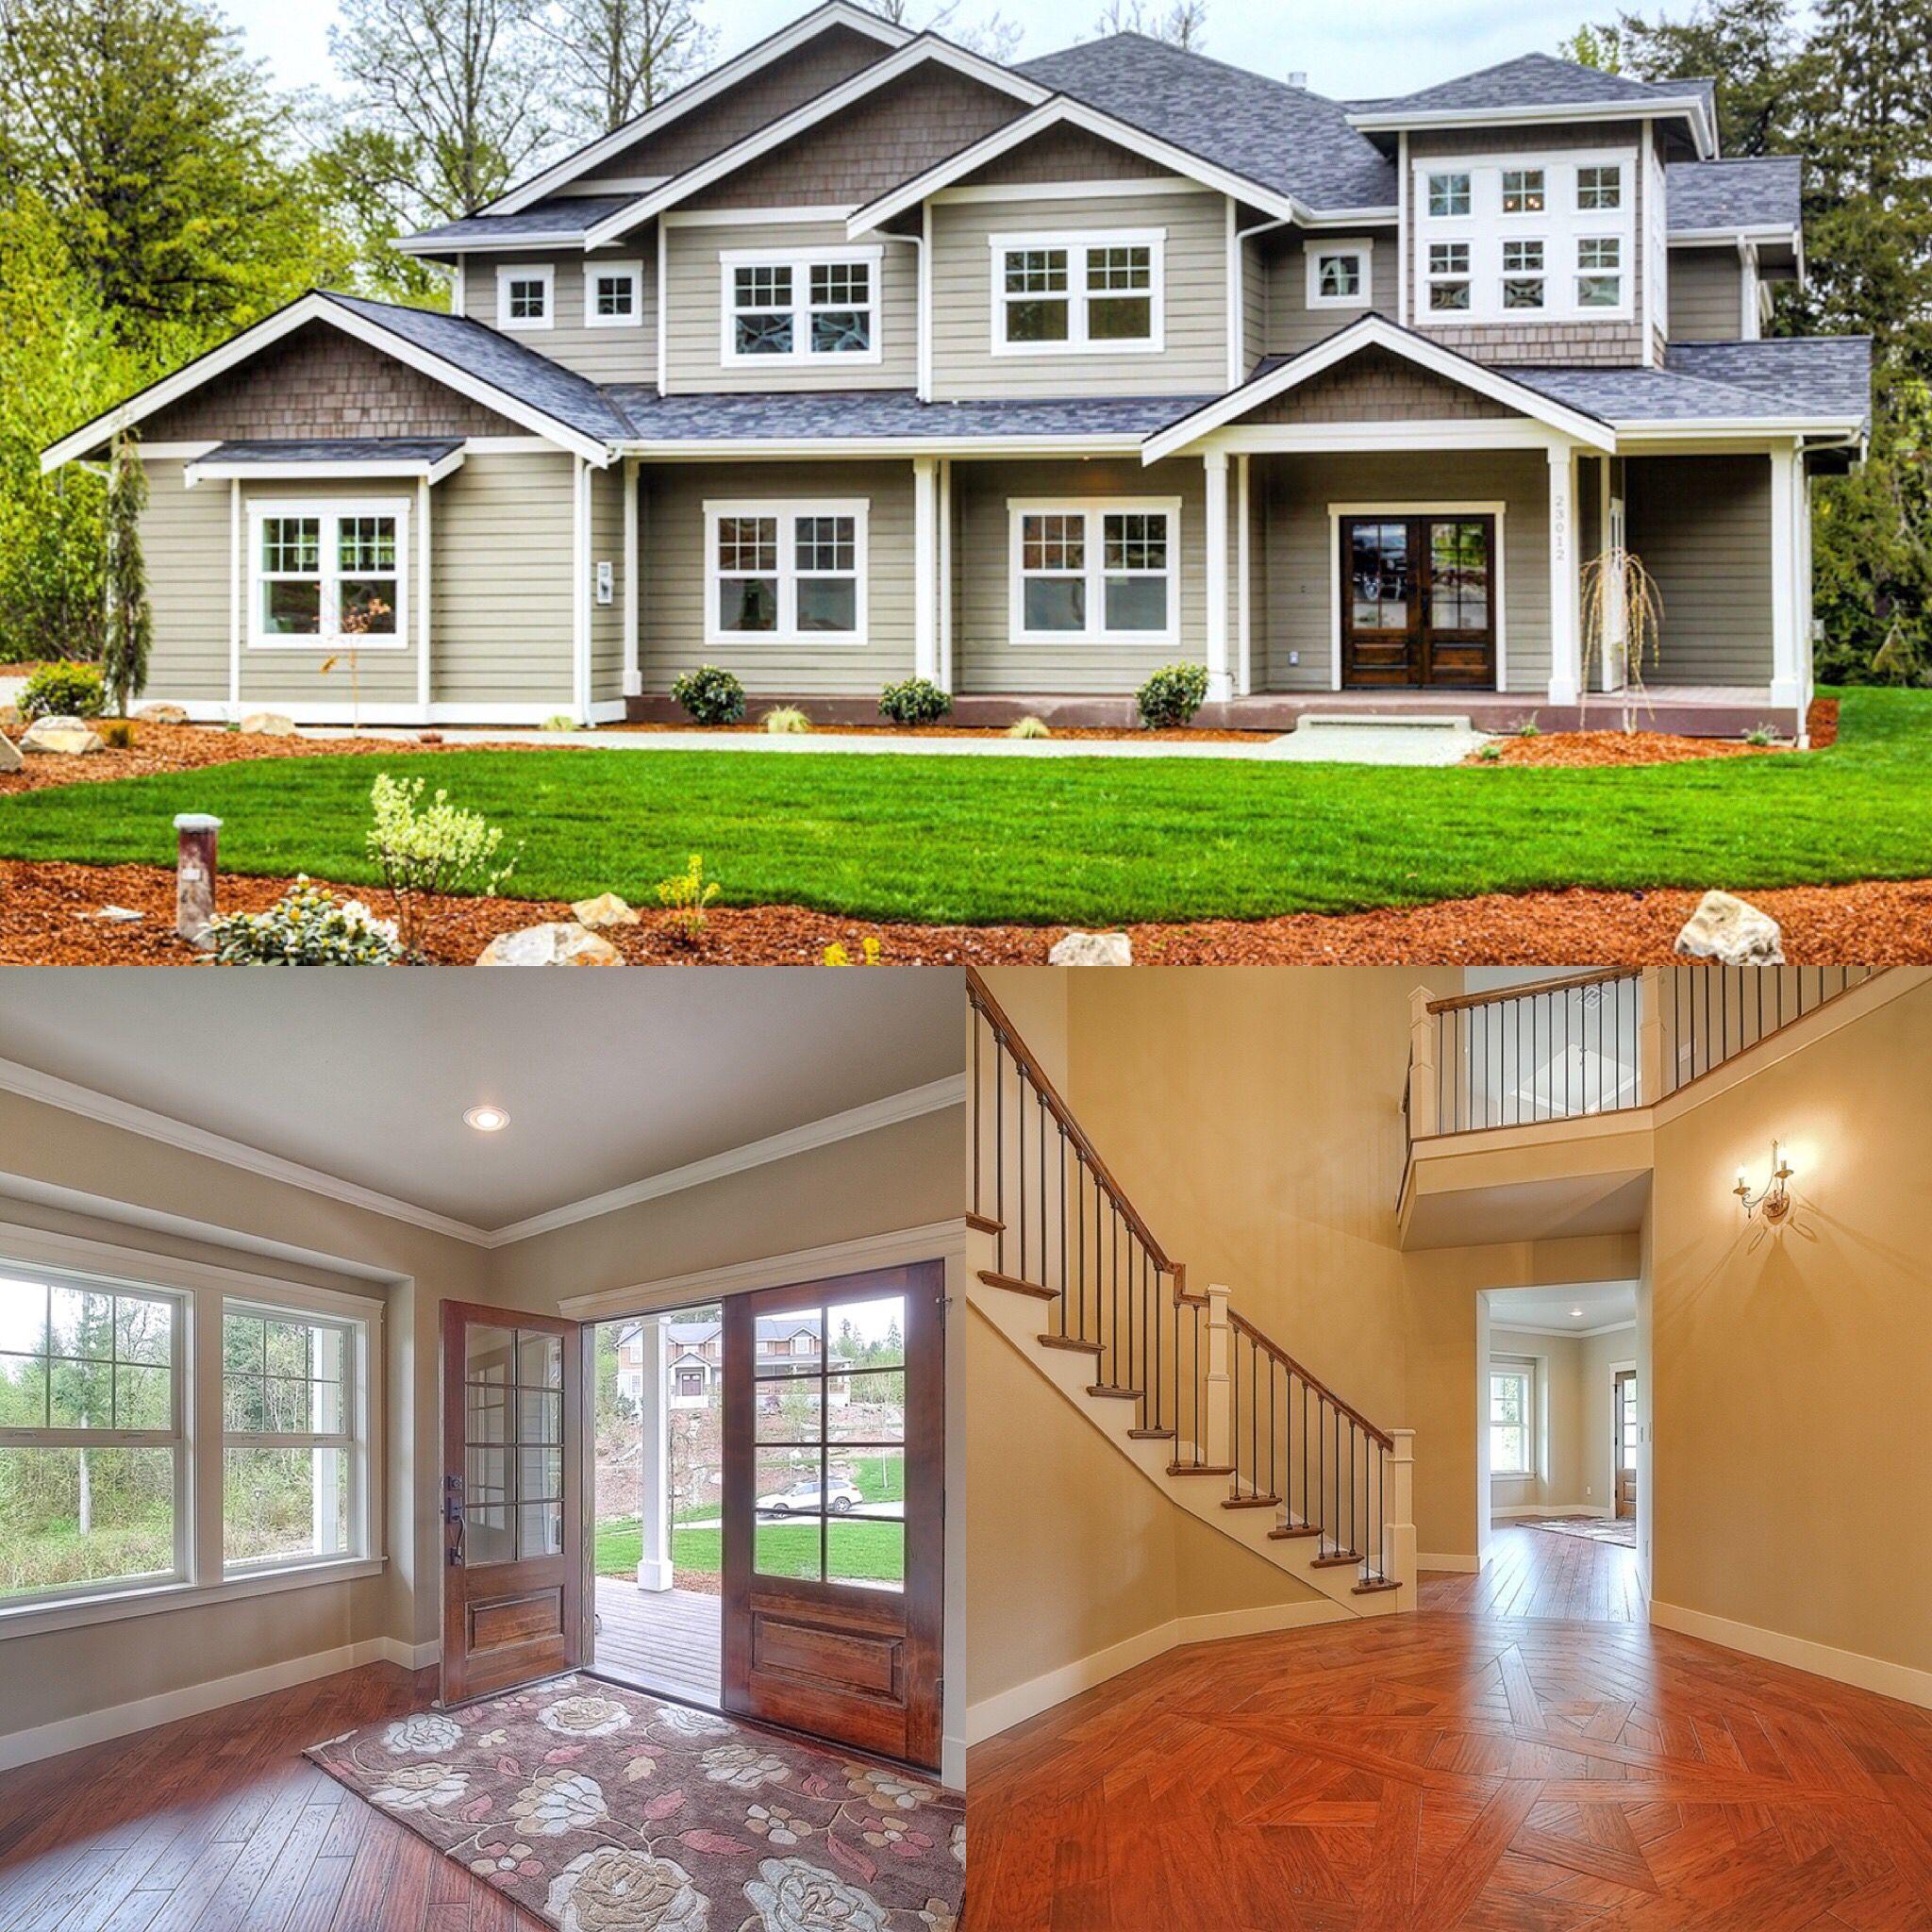 Dream Home Designs: Plan 23188JD: Substantial Columns And Trim Create Bold